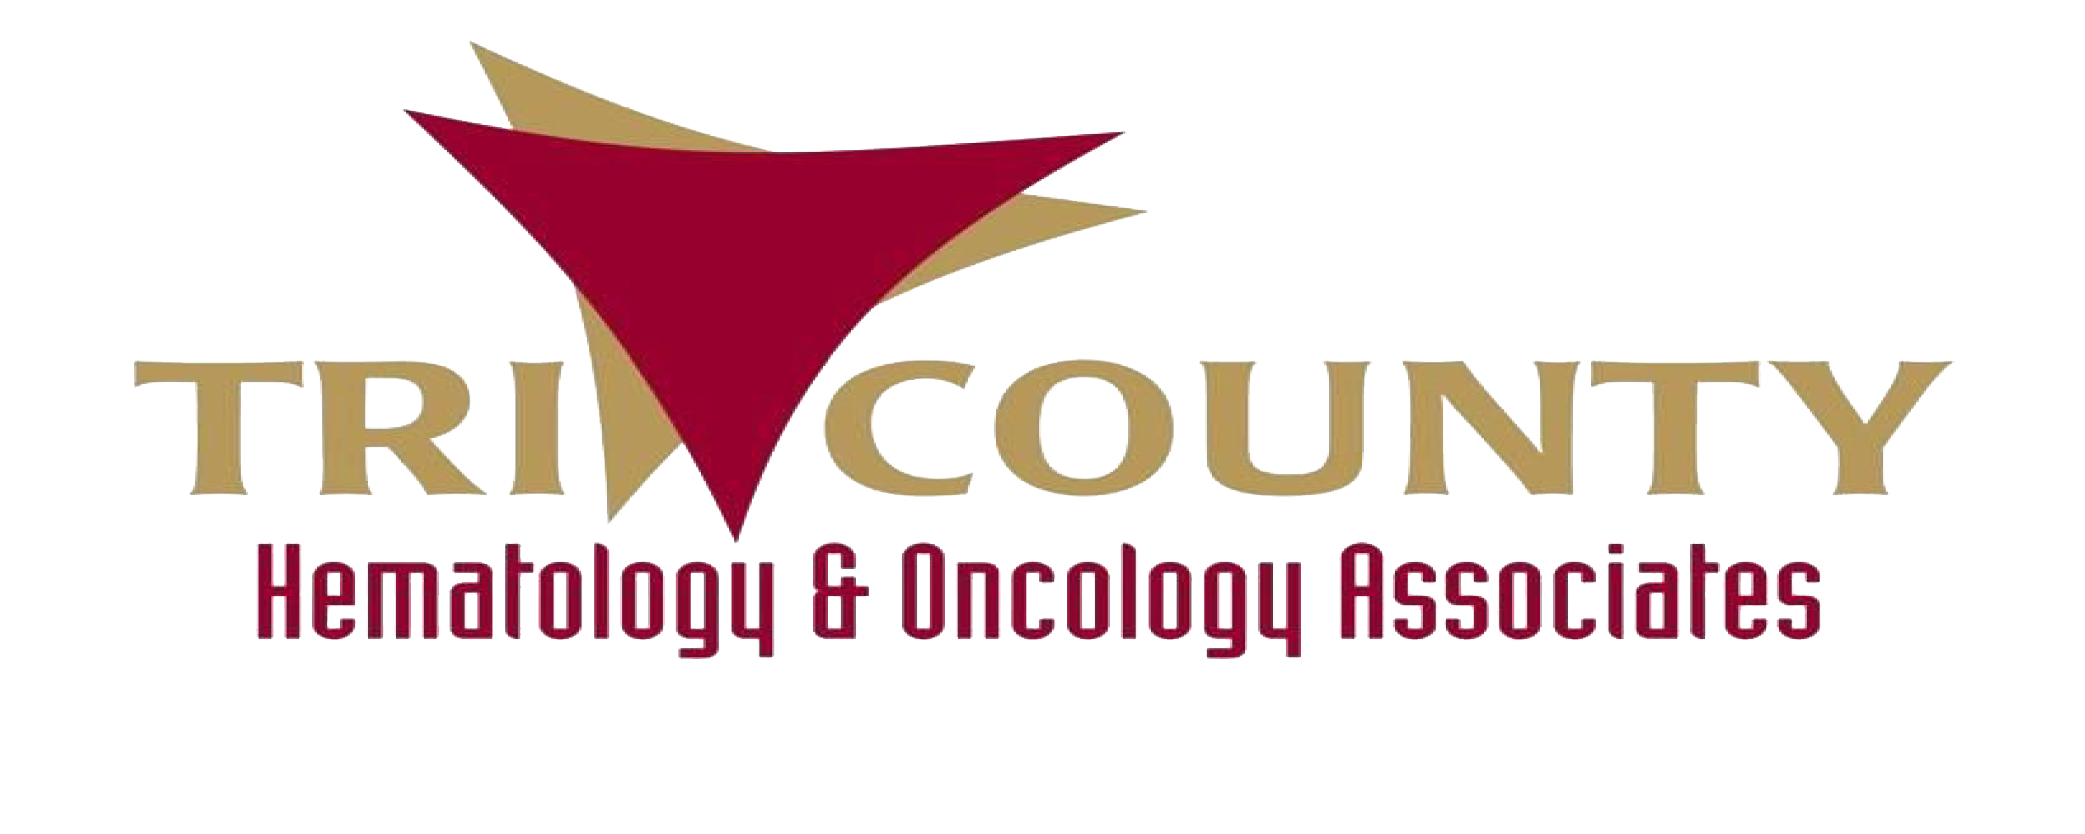 About Us – Tricounty Hematology Oncology